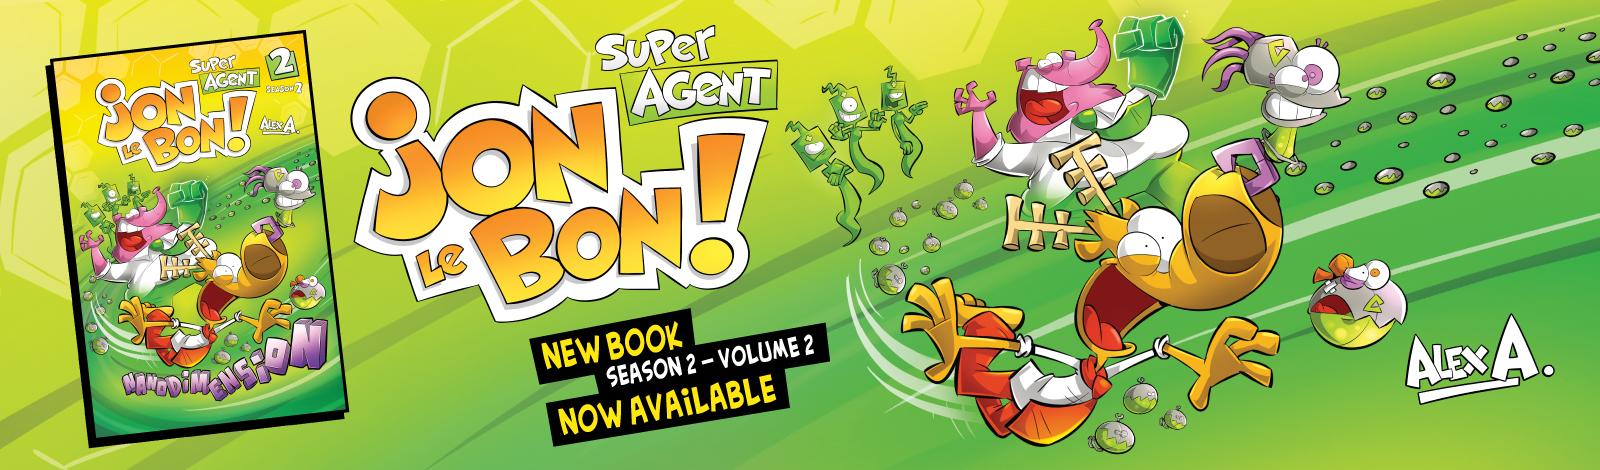 Super Agent Jon Le Bon! Season 2, Volume 2 : Nanodimension